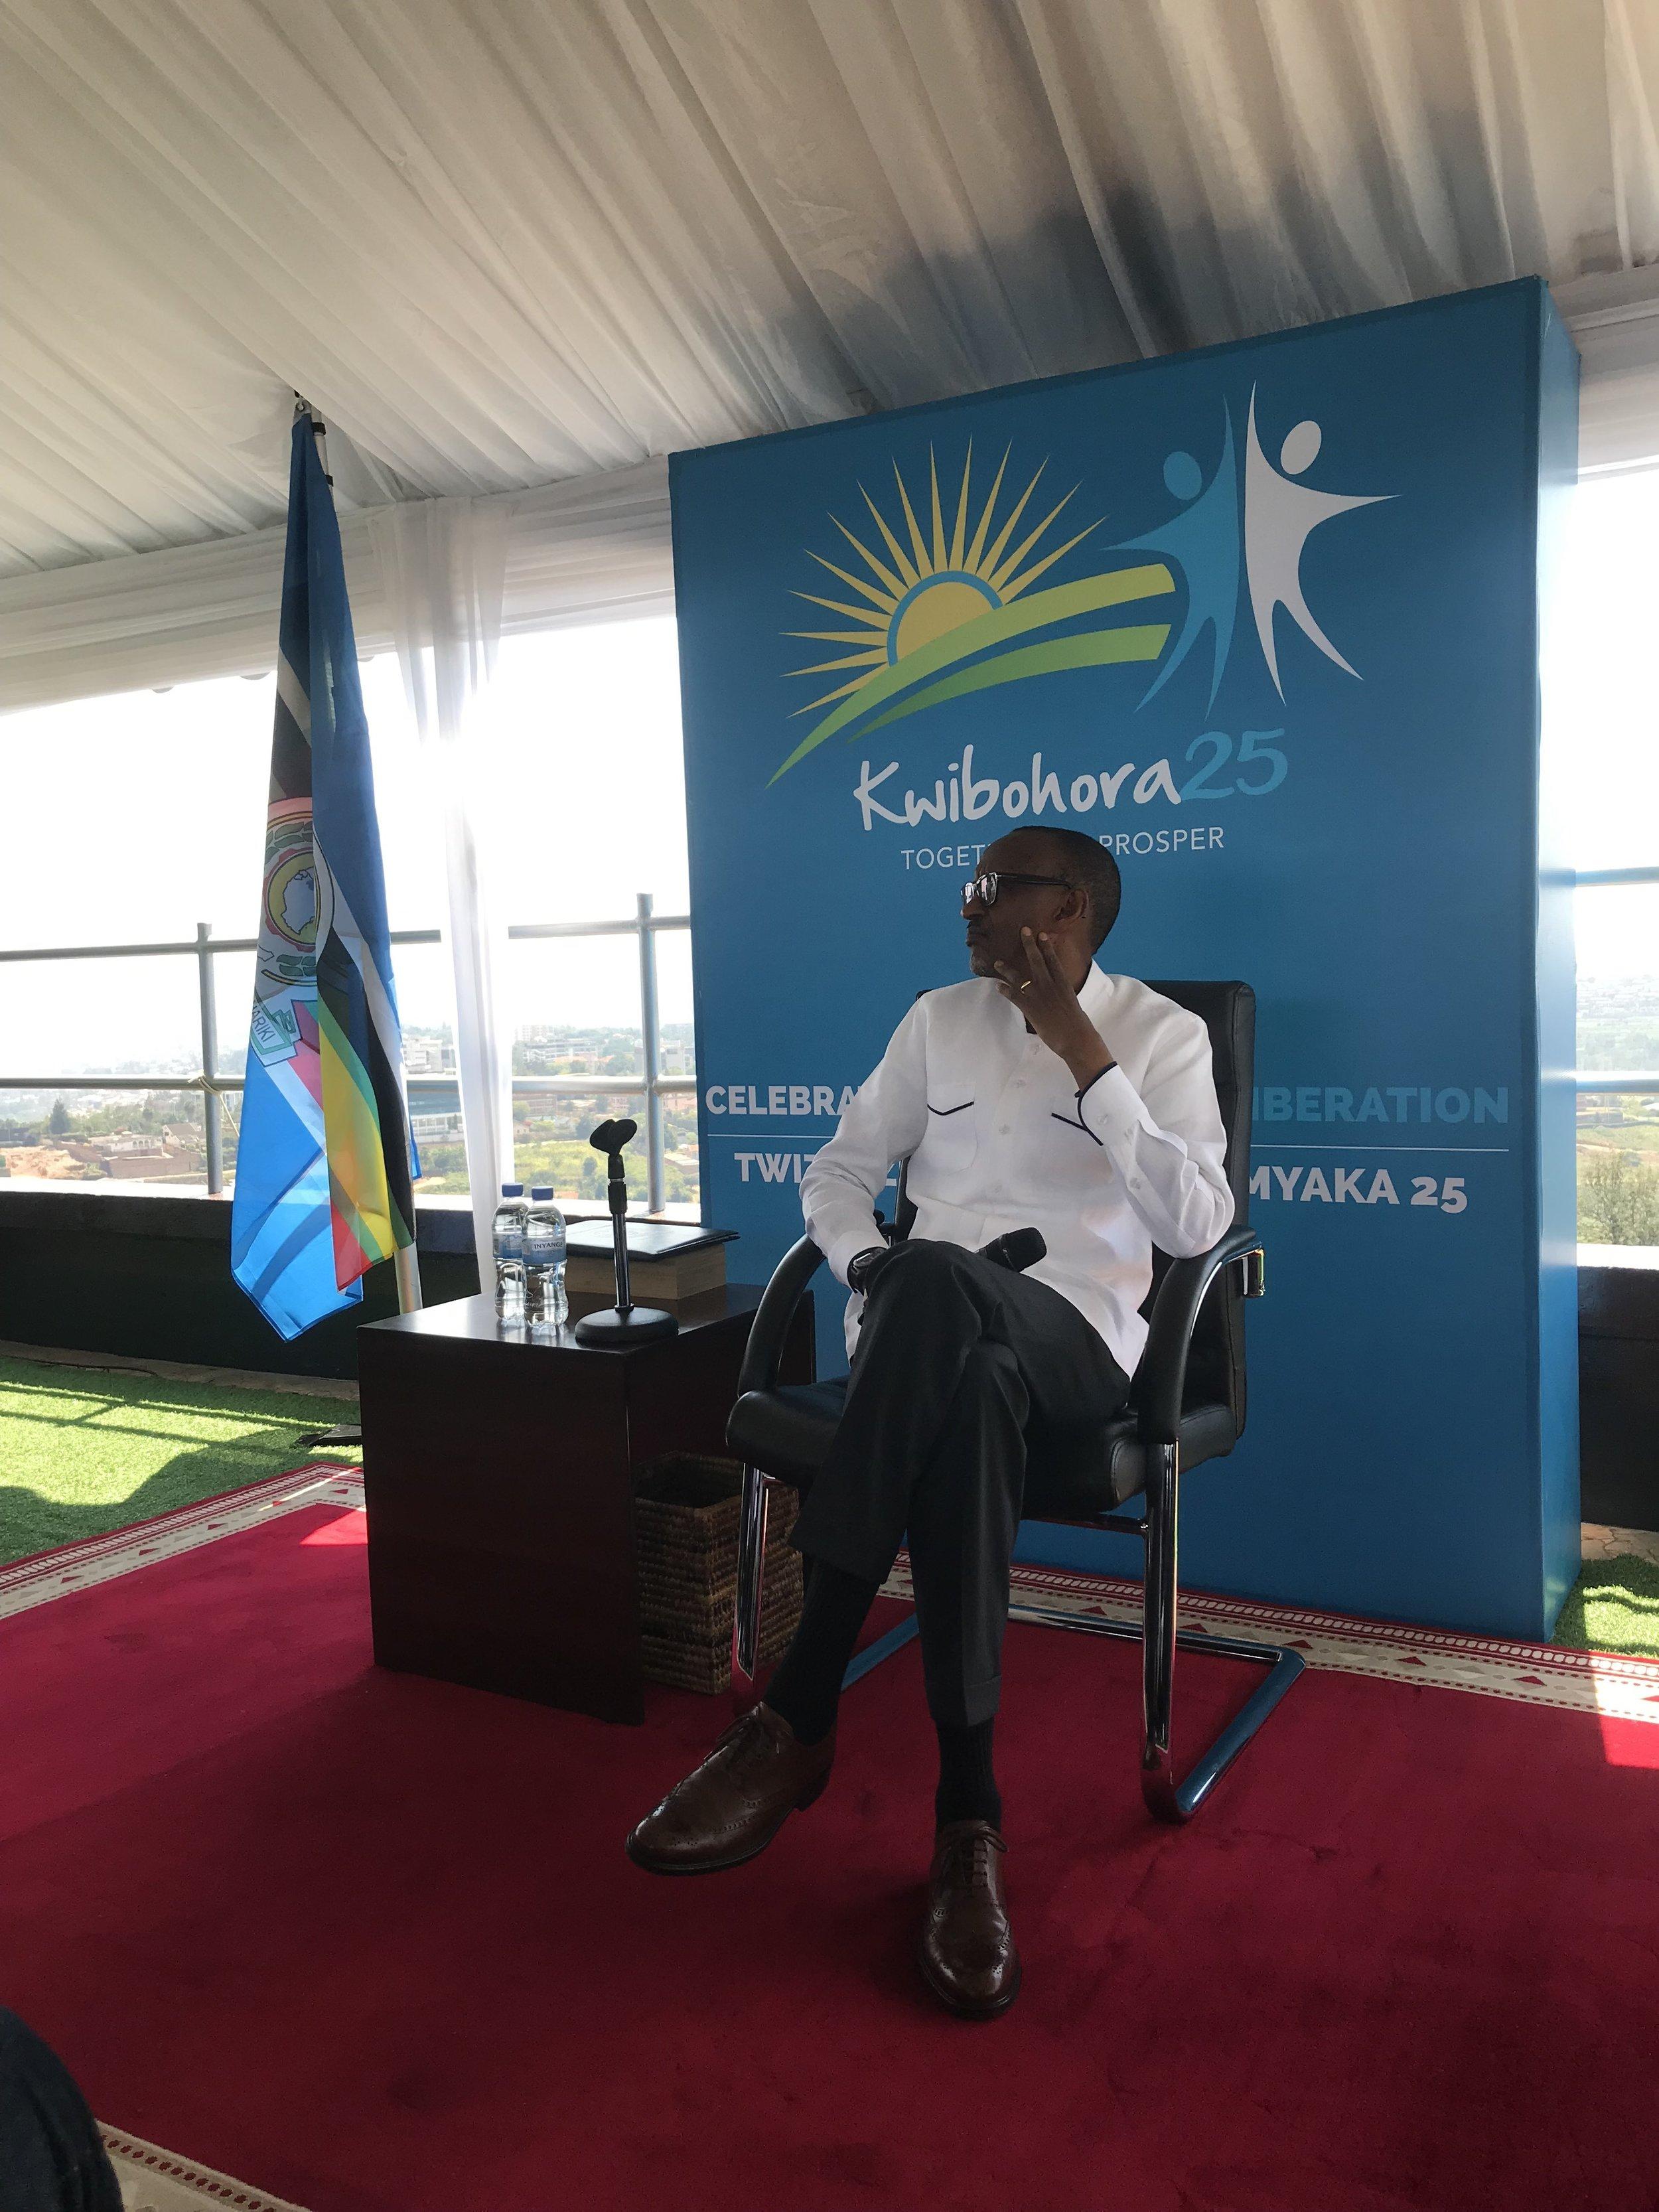 IMG_5595 2VickieRemoe-travel-kigali-rwanda-review-kwibohora25-hotels-africa.JPG